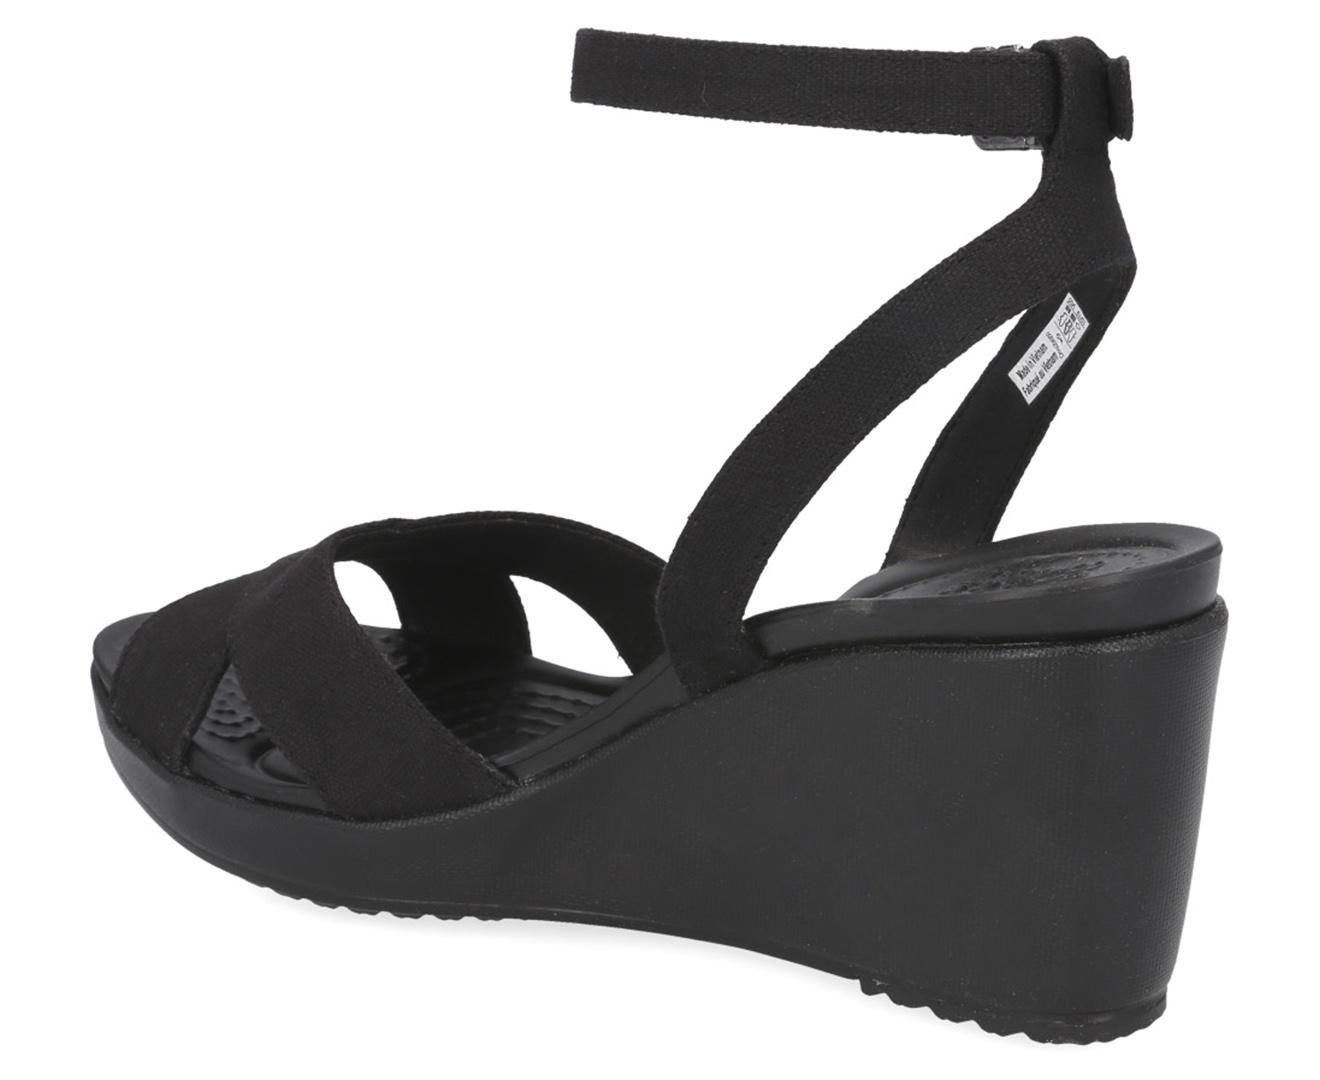 Crocs Women's Leigh II Cross Strap Ankle Wedge Sandals BlackBlack